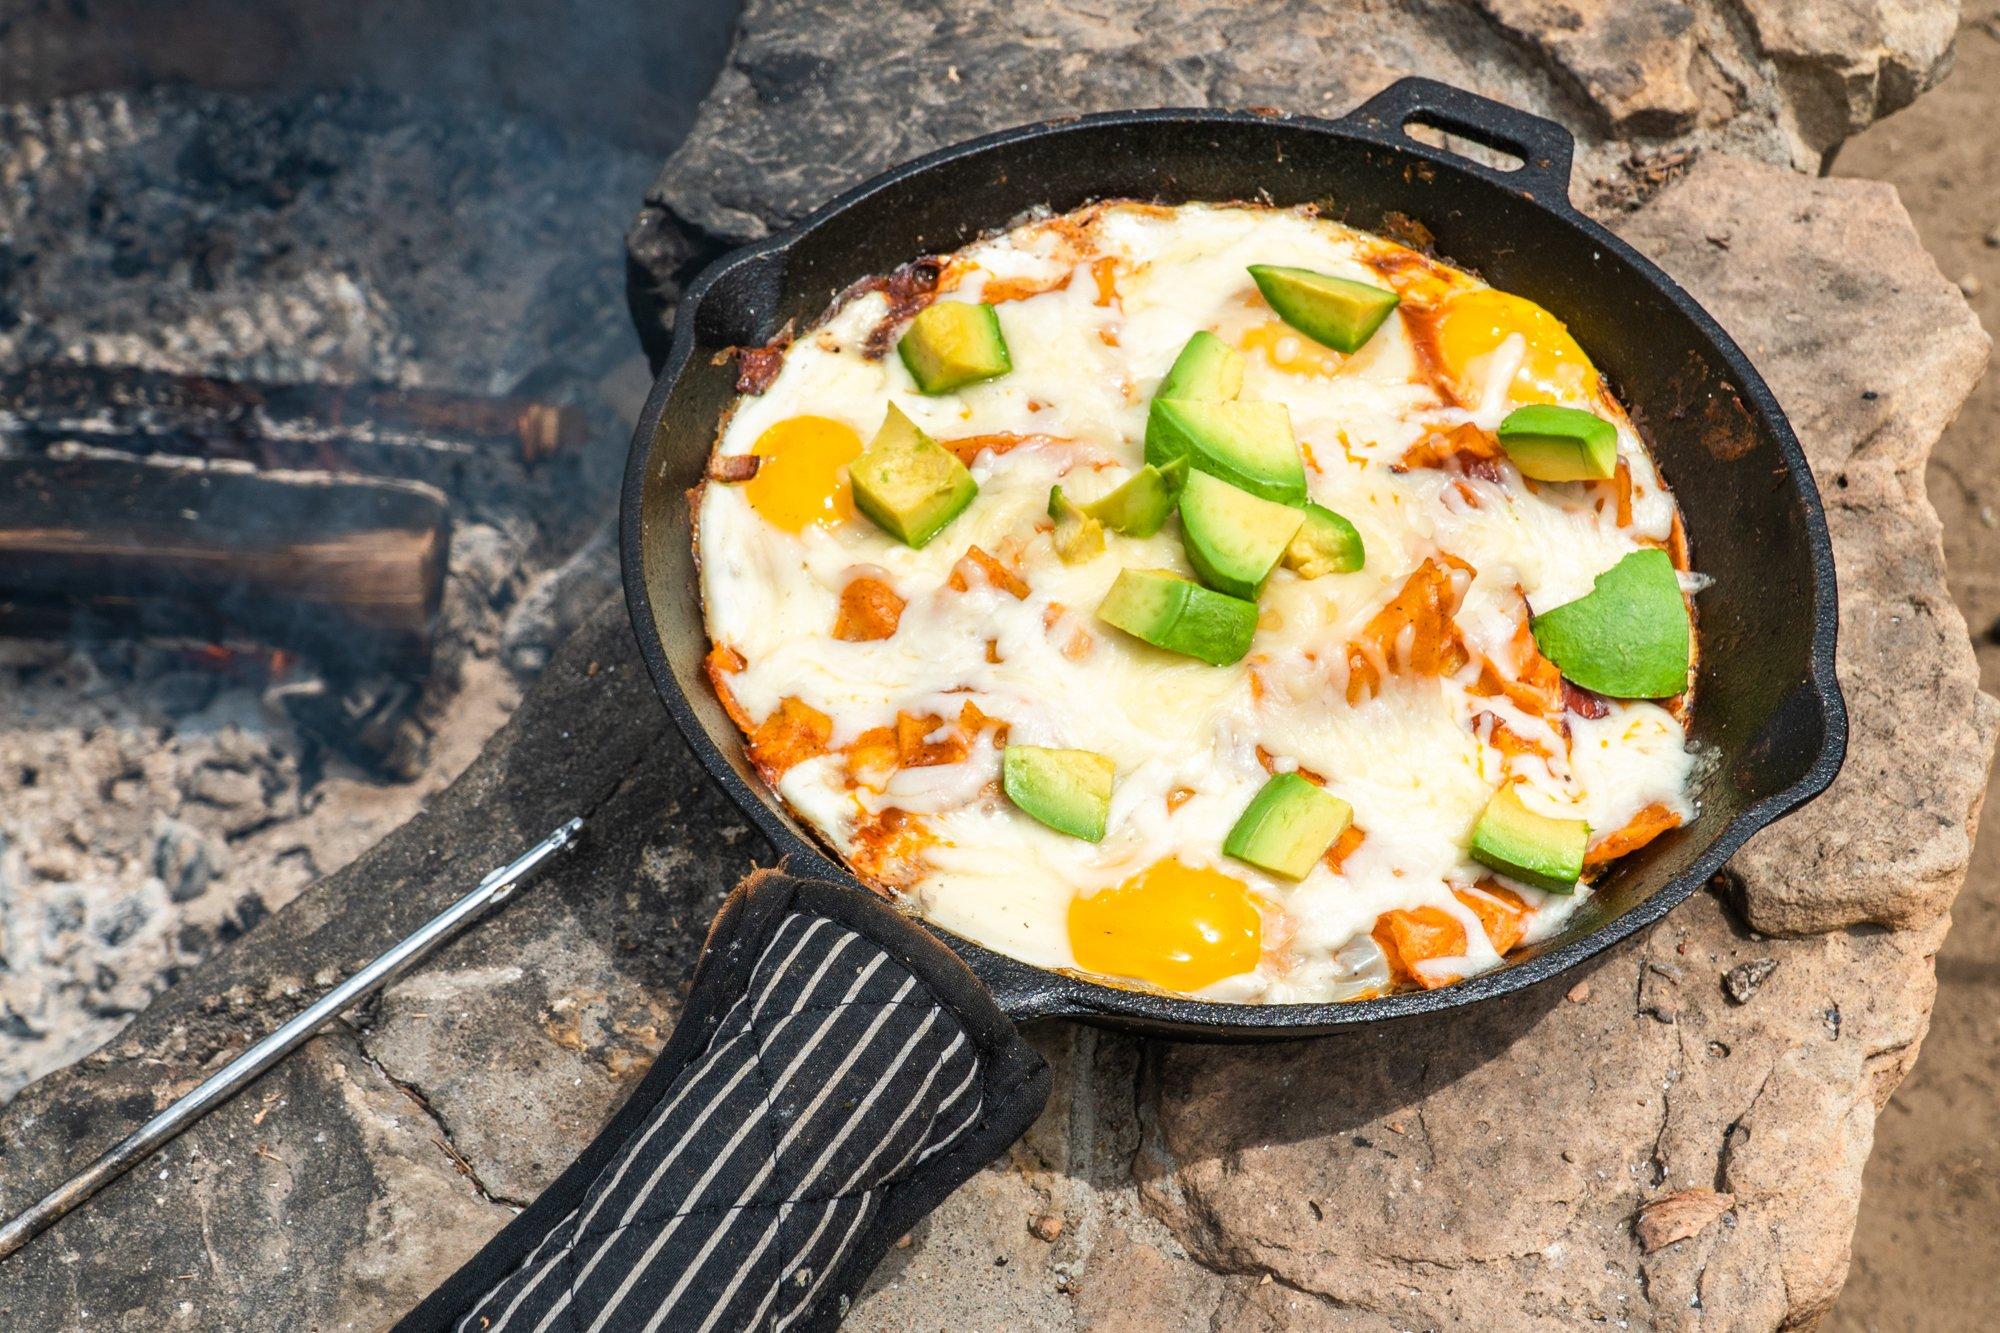 Campfire Chilaquiles Recipe